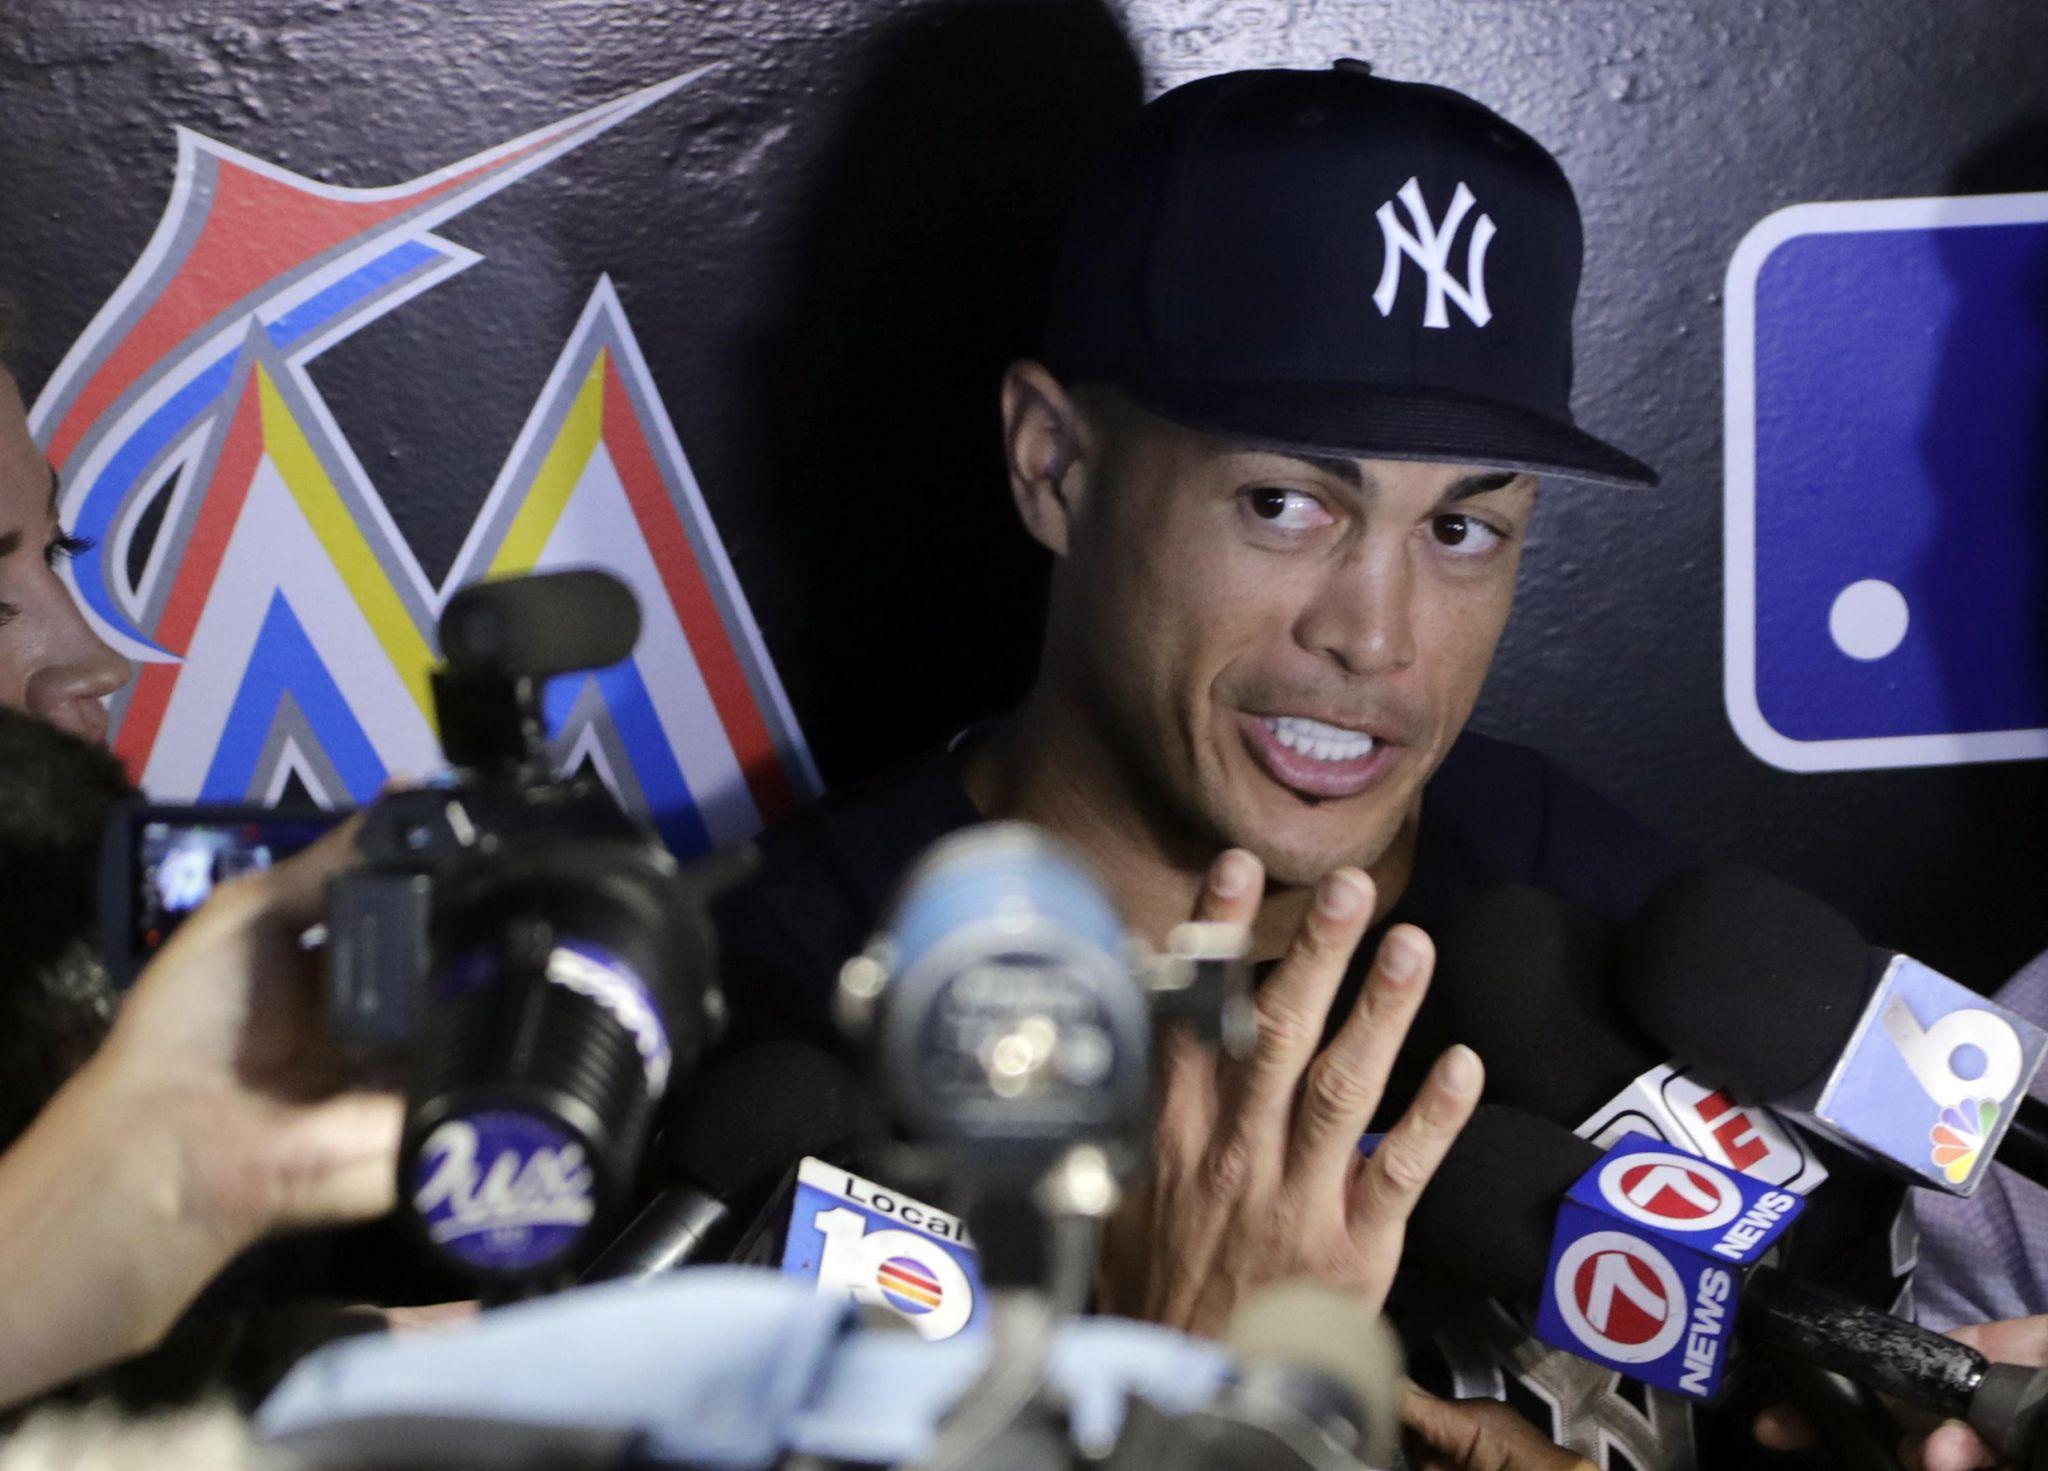 Yankees_in_miami_baseball_88696_s2048x1471